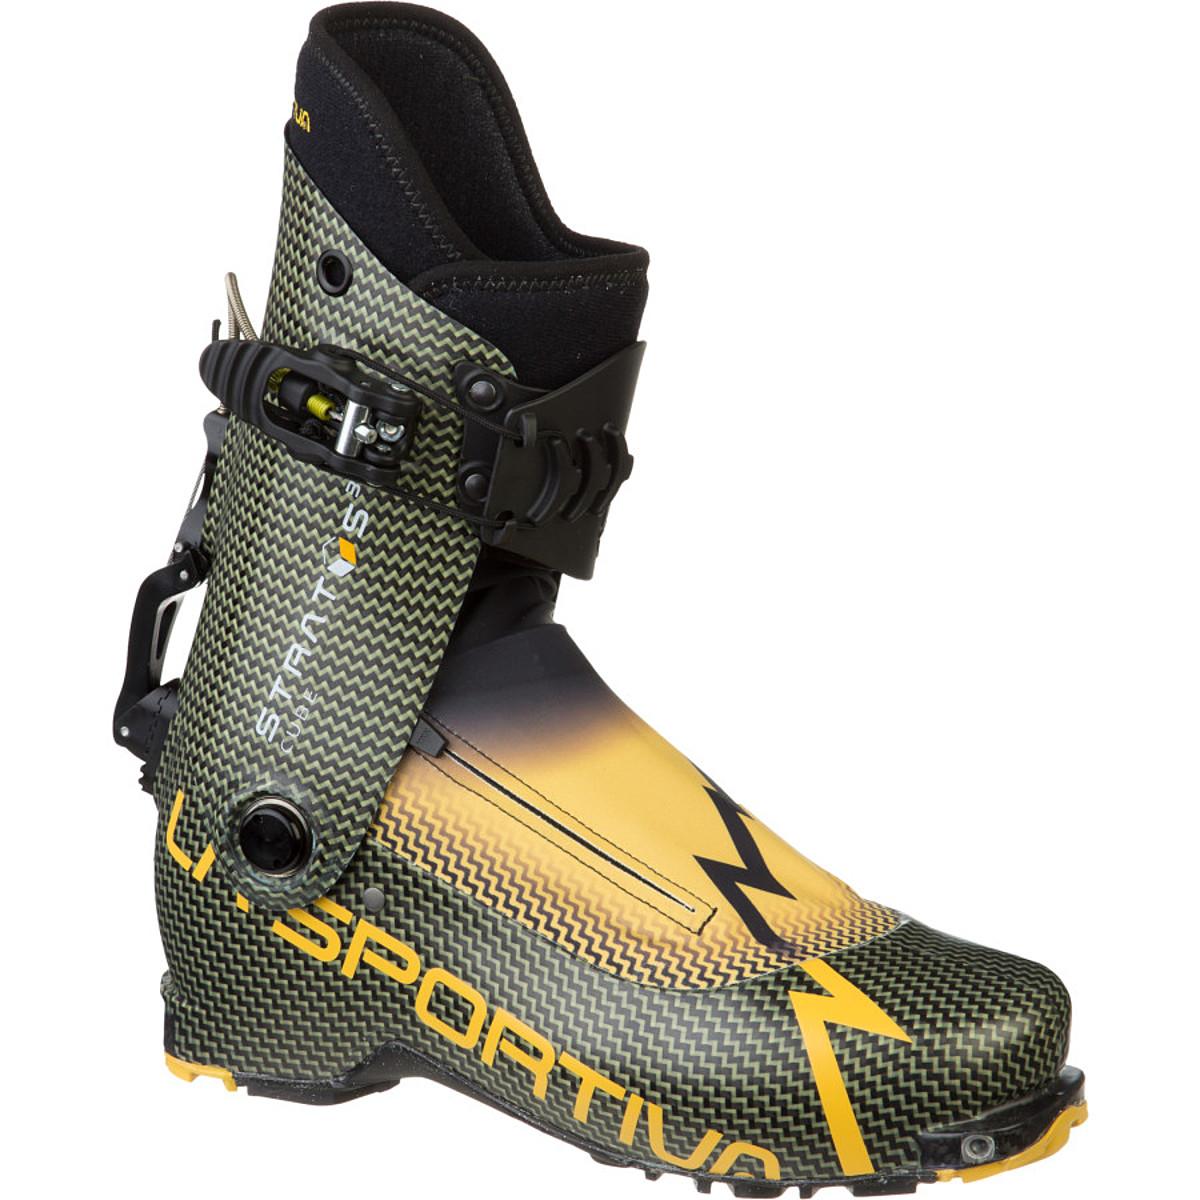 photo: La Sportiva Stratos Cube alpine touring boot